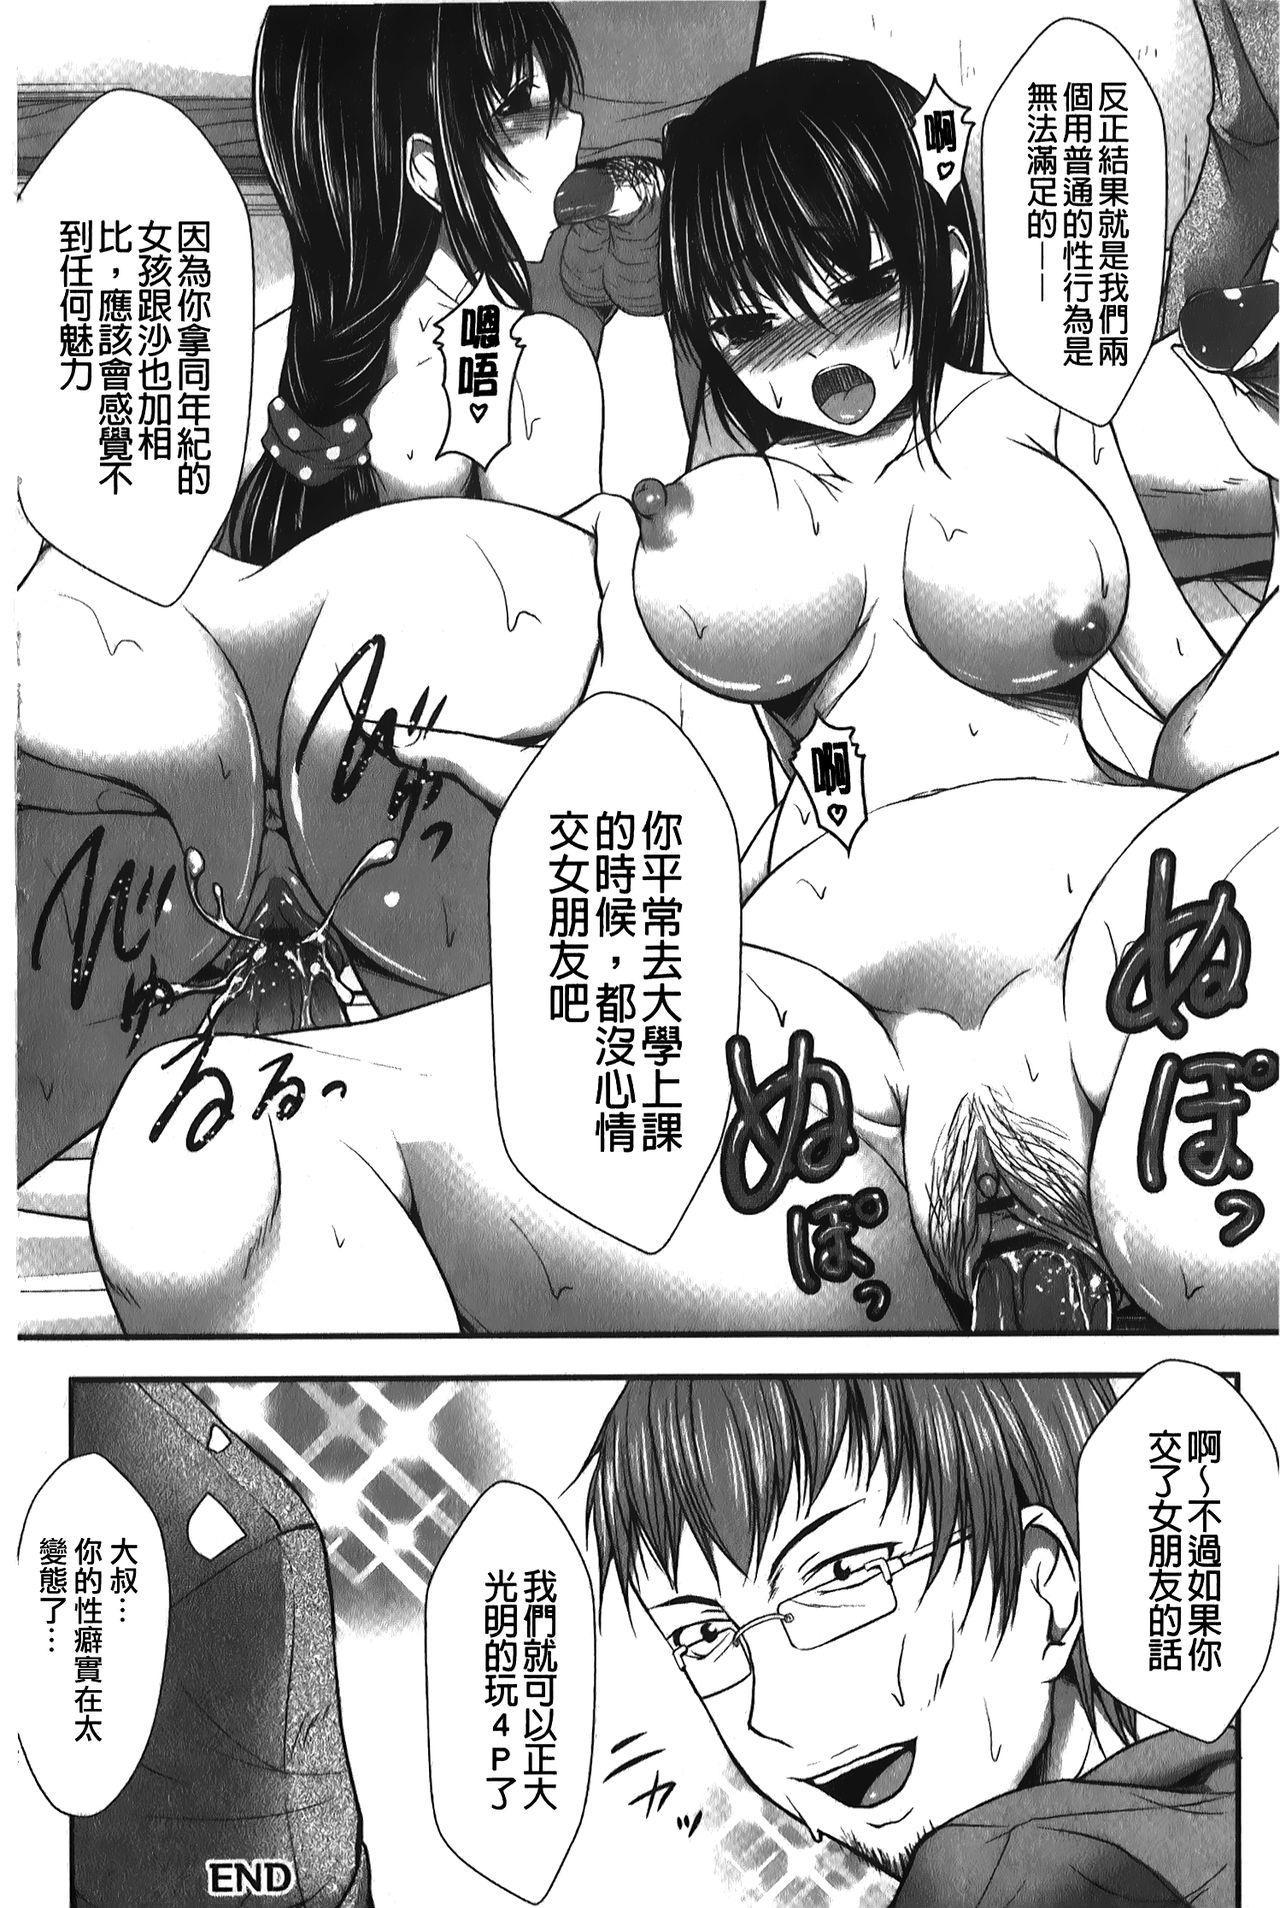 Hameochi | 戳插墮落 166